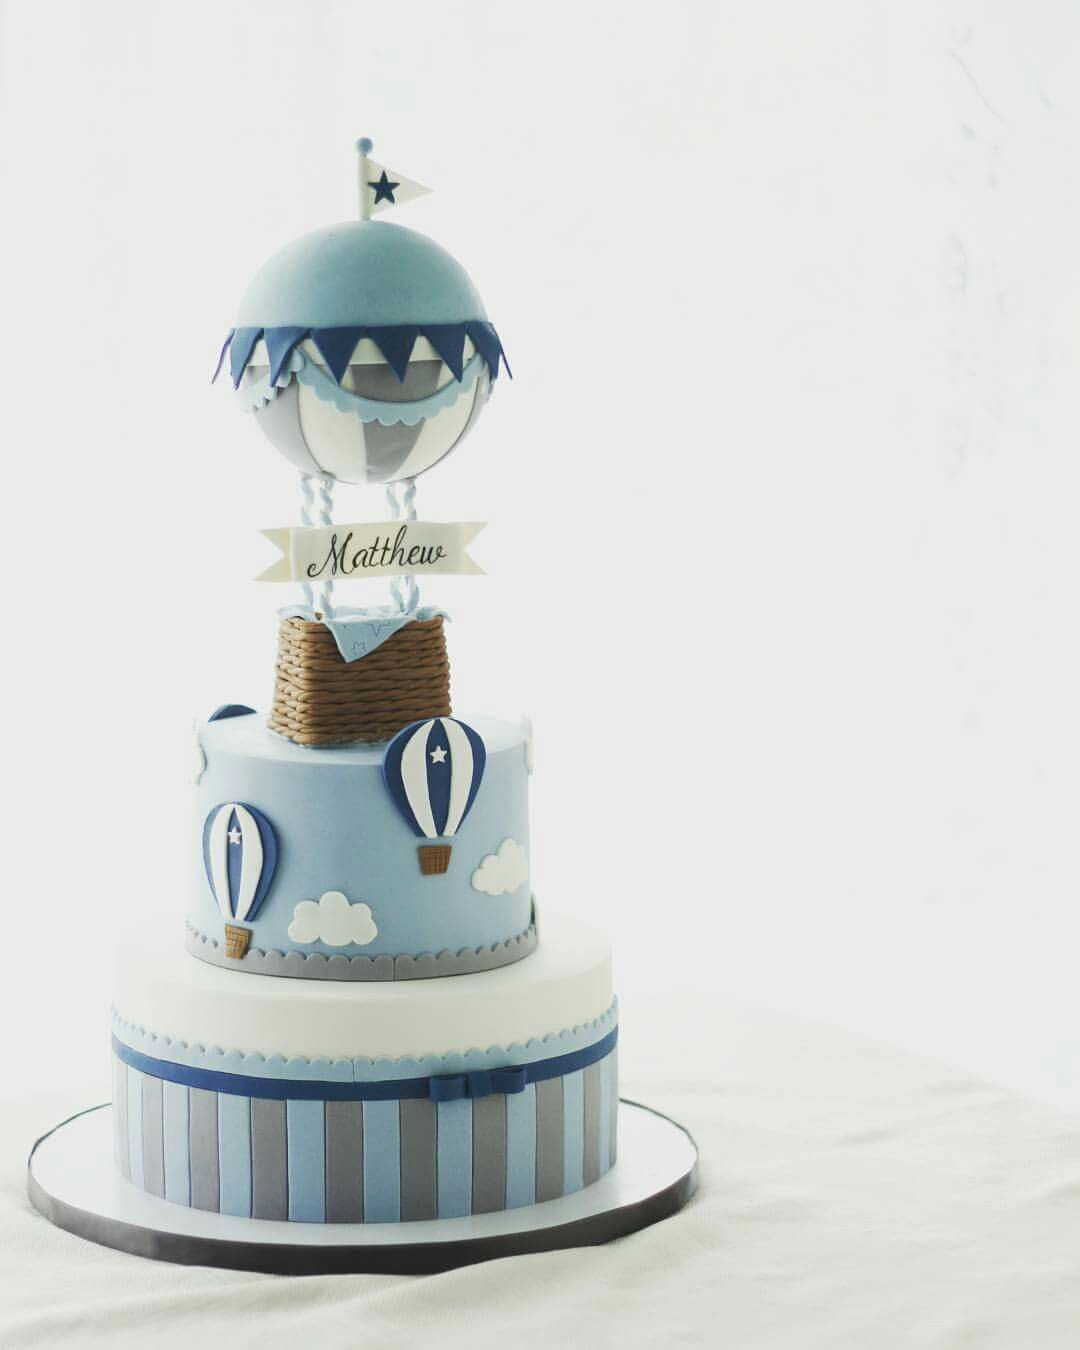 Hot Air Balloon Cake With Images Hot Air Balloon Cake Hot Air